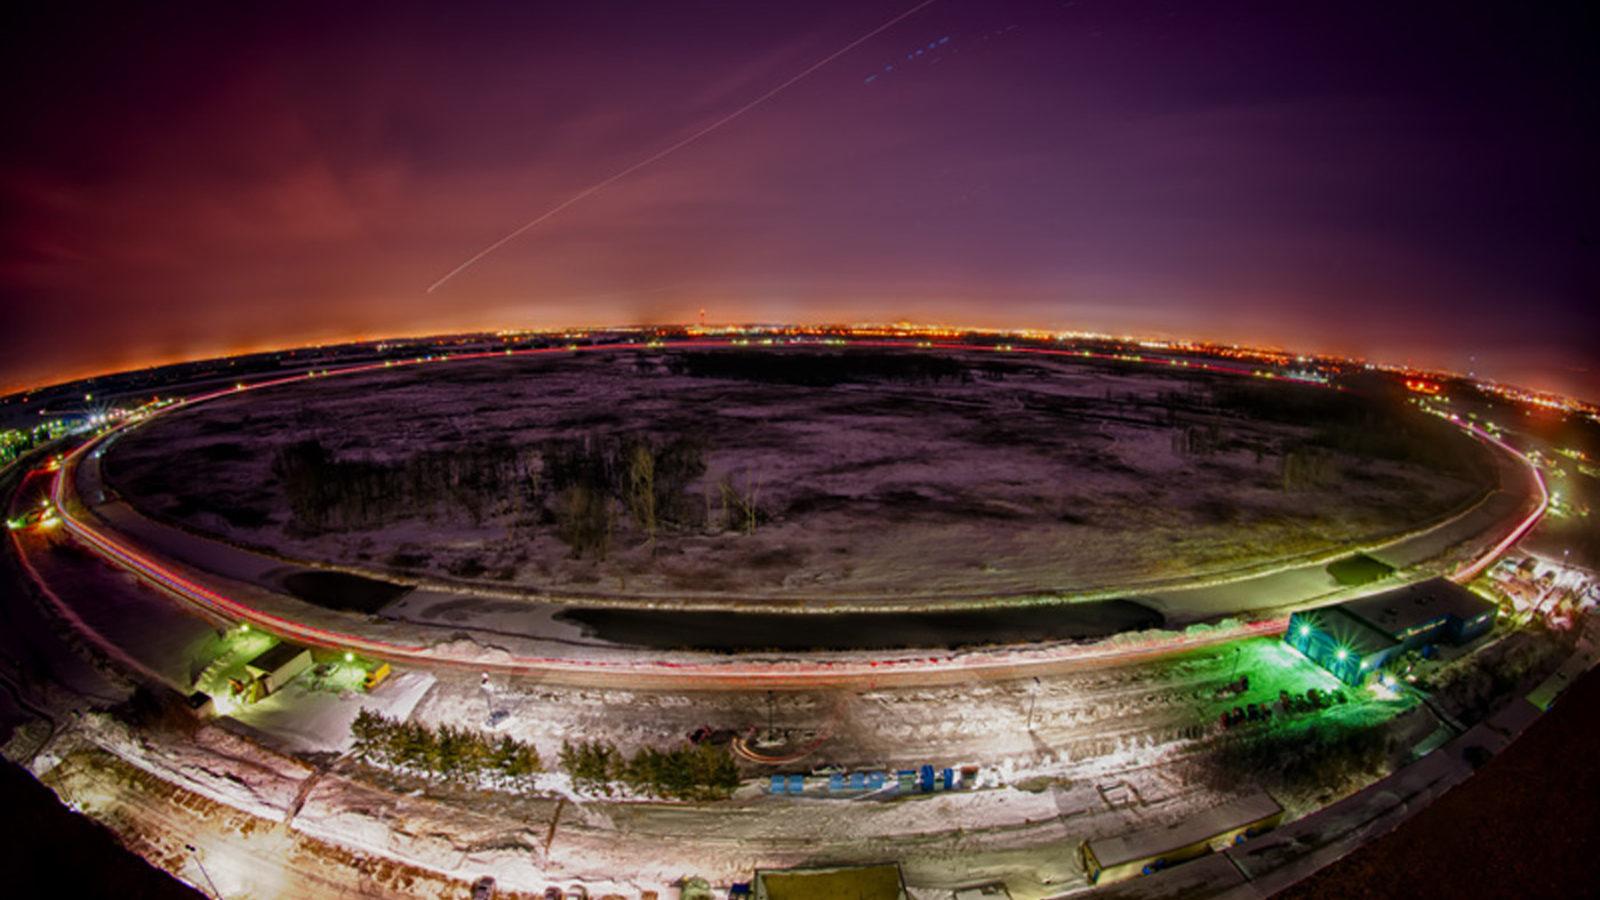 Photo: Tevatron at night